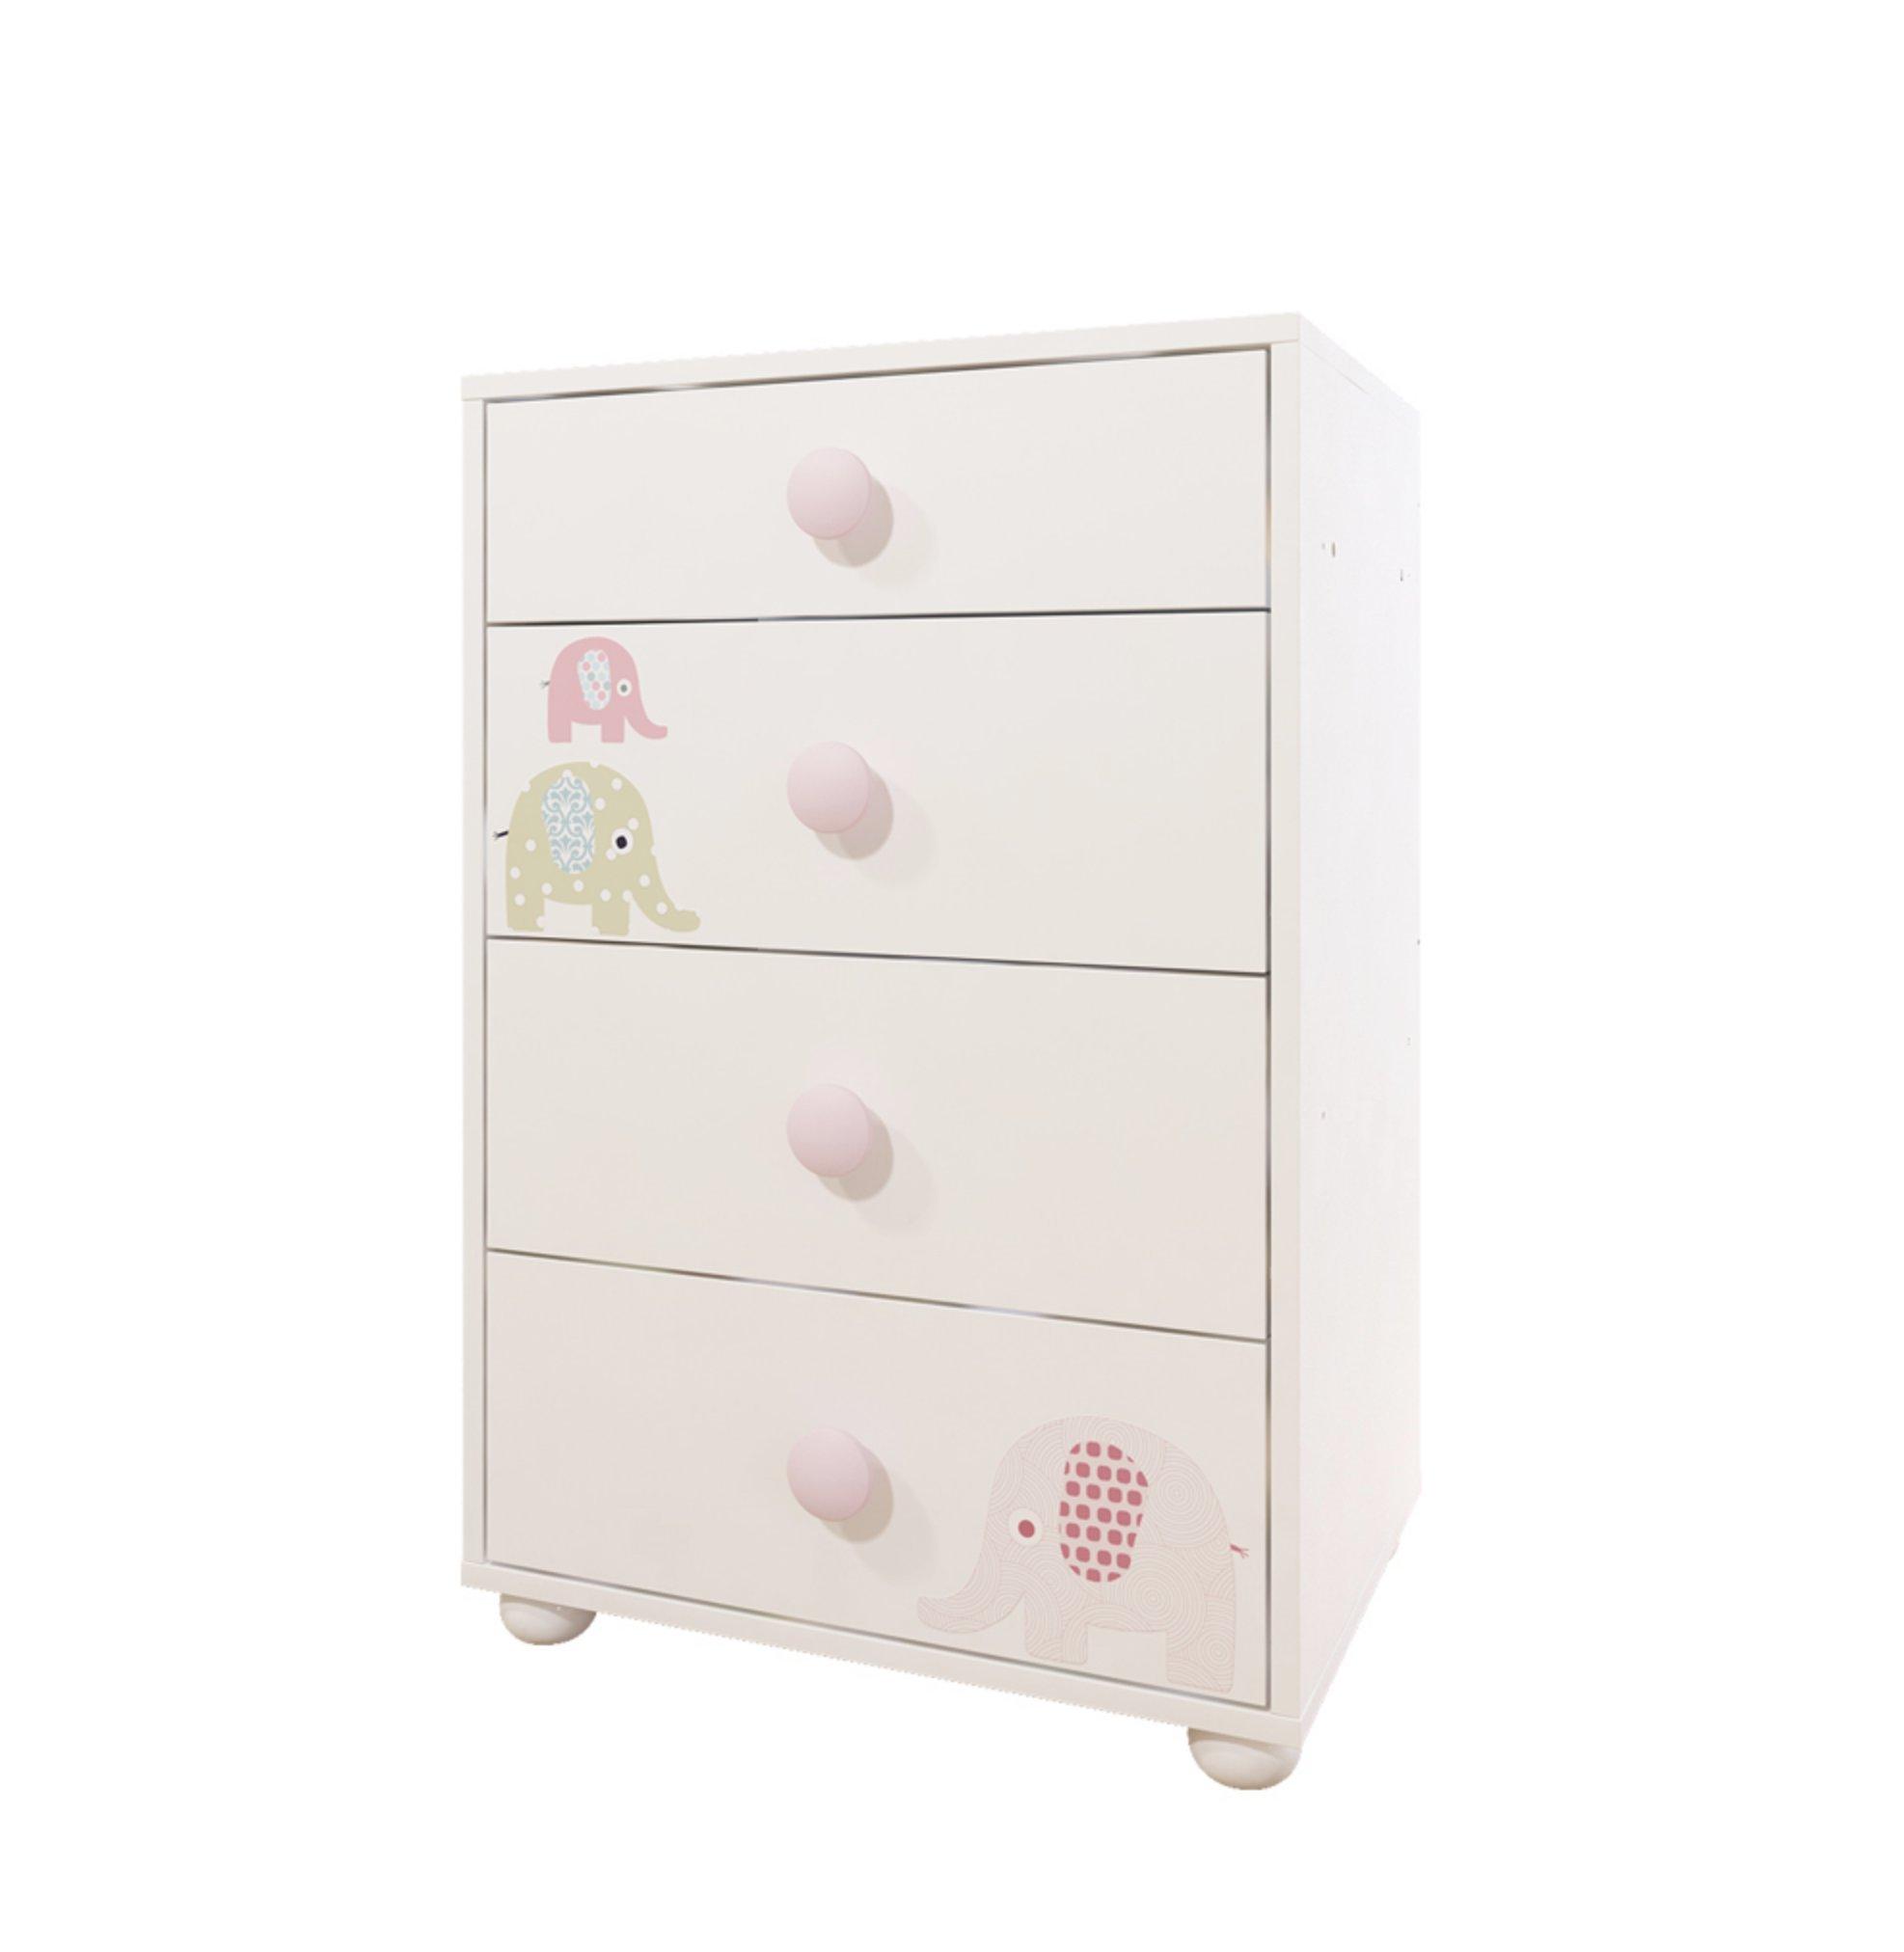 Bony Baby 4-Drawer Chest Nursery Dresser, White with Pink Elephants